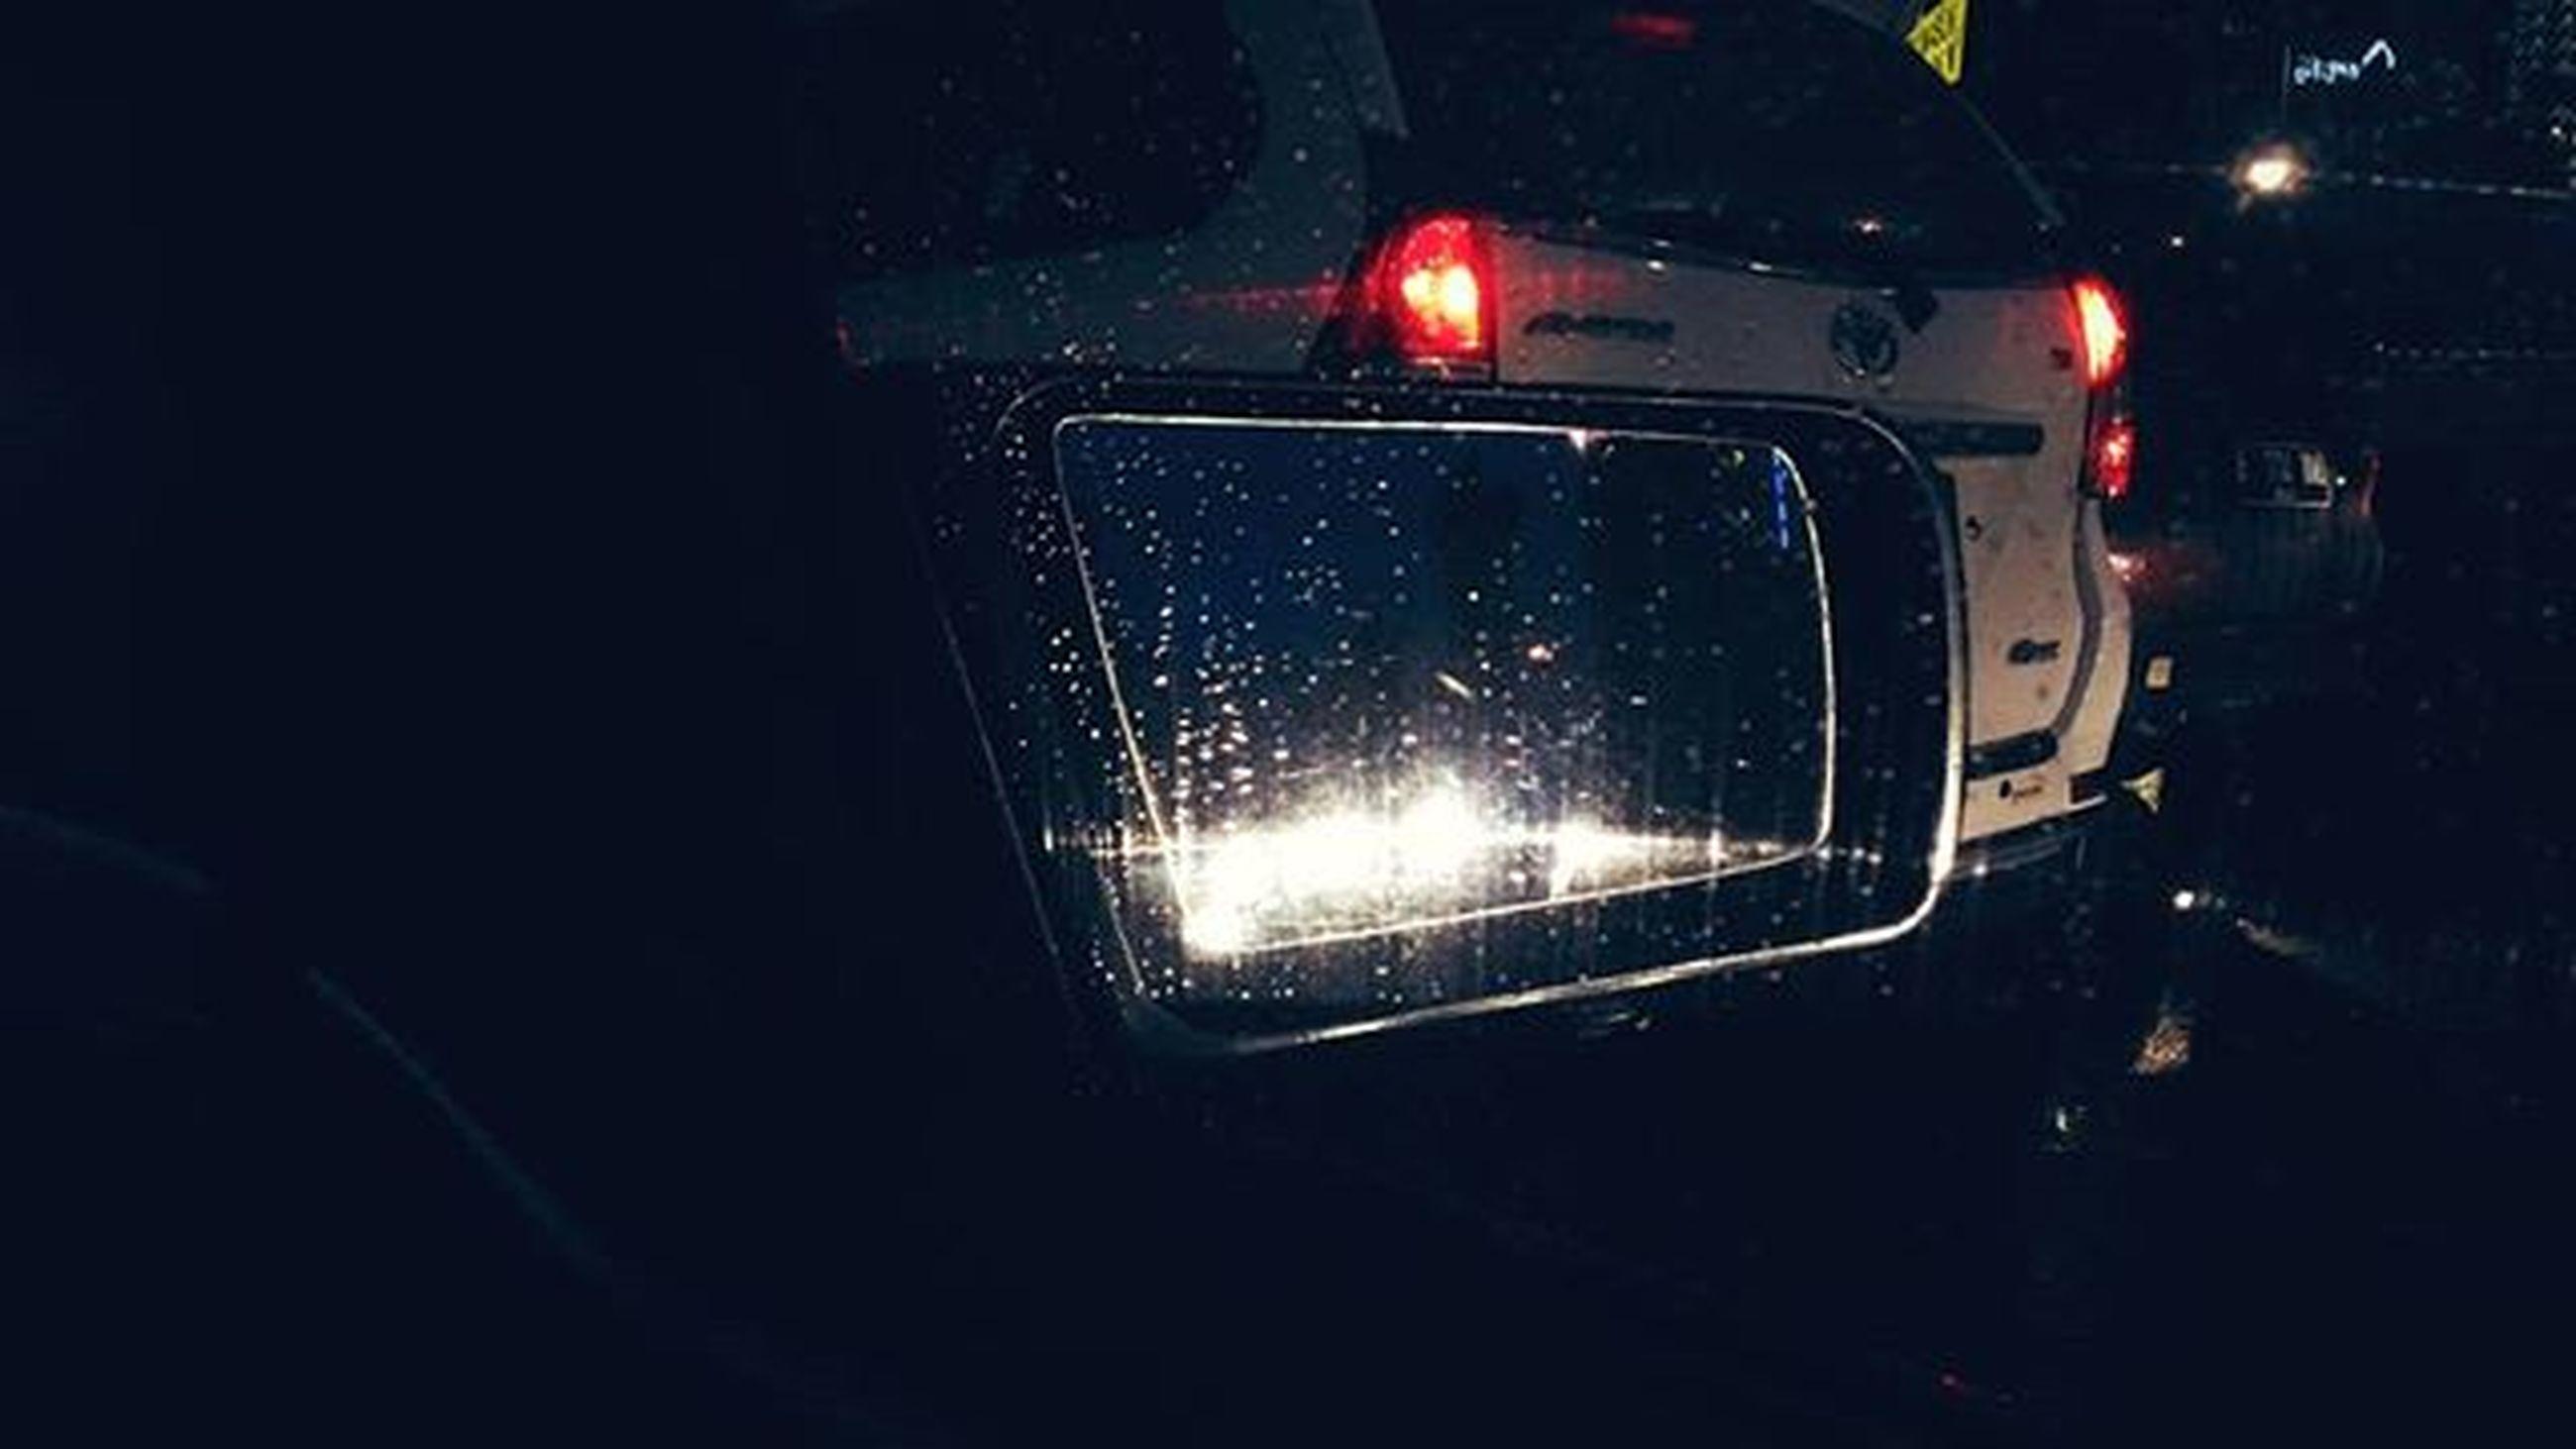 transportation, car, mode of transport, land vehicle, illuminated, headlight, night, glass - material, vehicle interior, transparent, travel, close-up, windshield, road, no people, car interior, street, indoors, tail light, dark